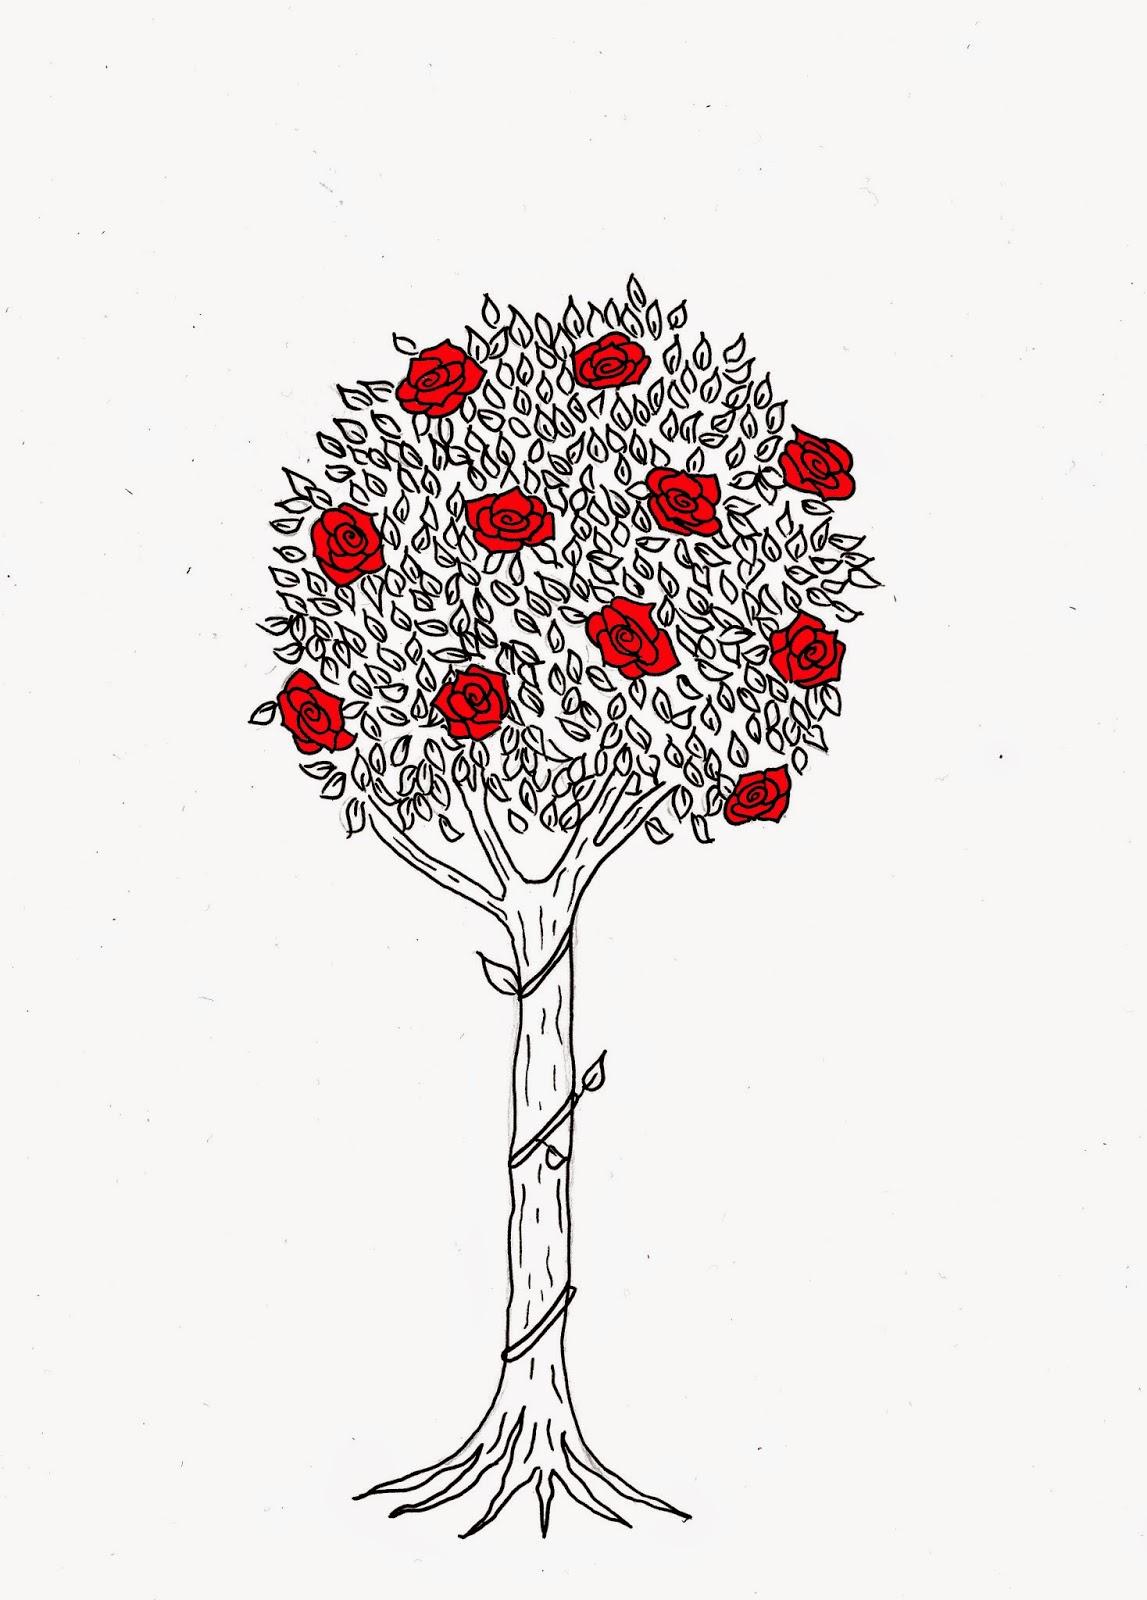 Drawn rose bush rose tree Drawing of adding because also